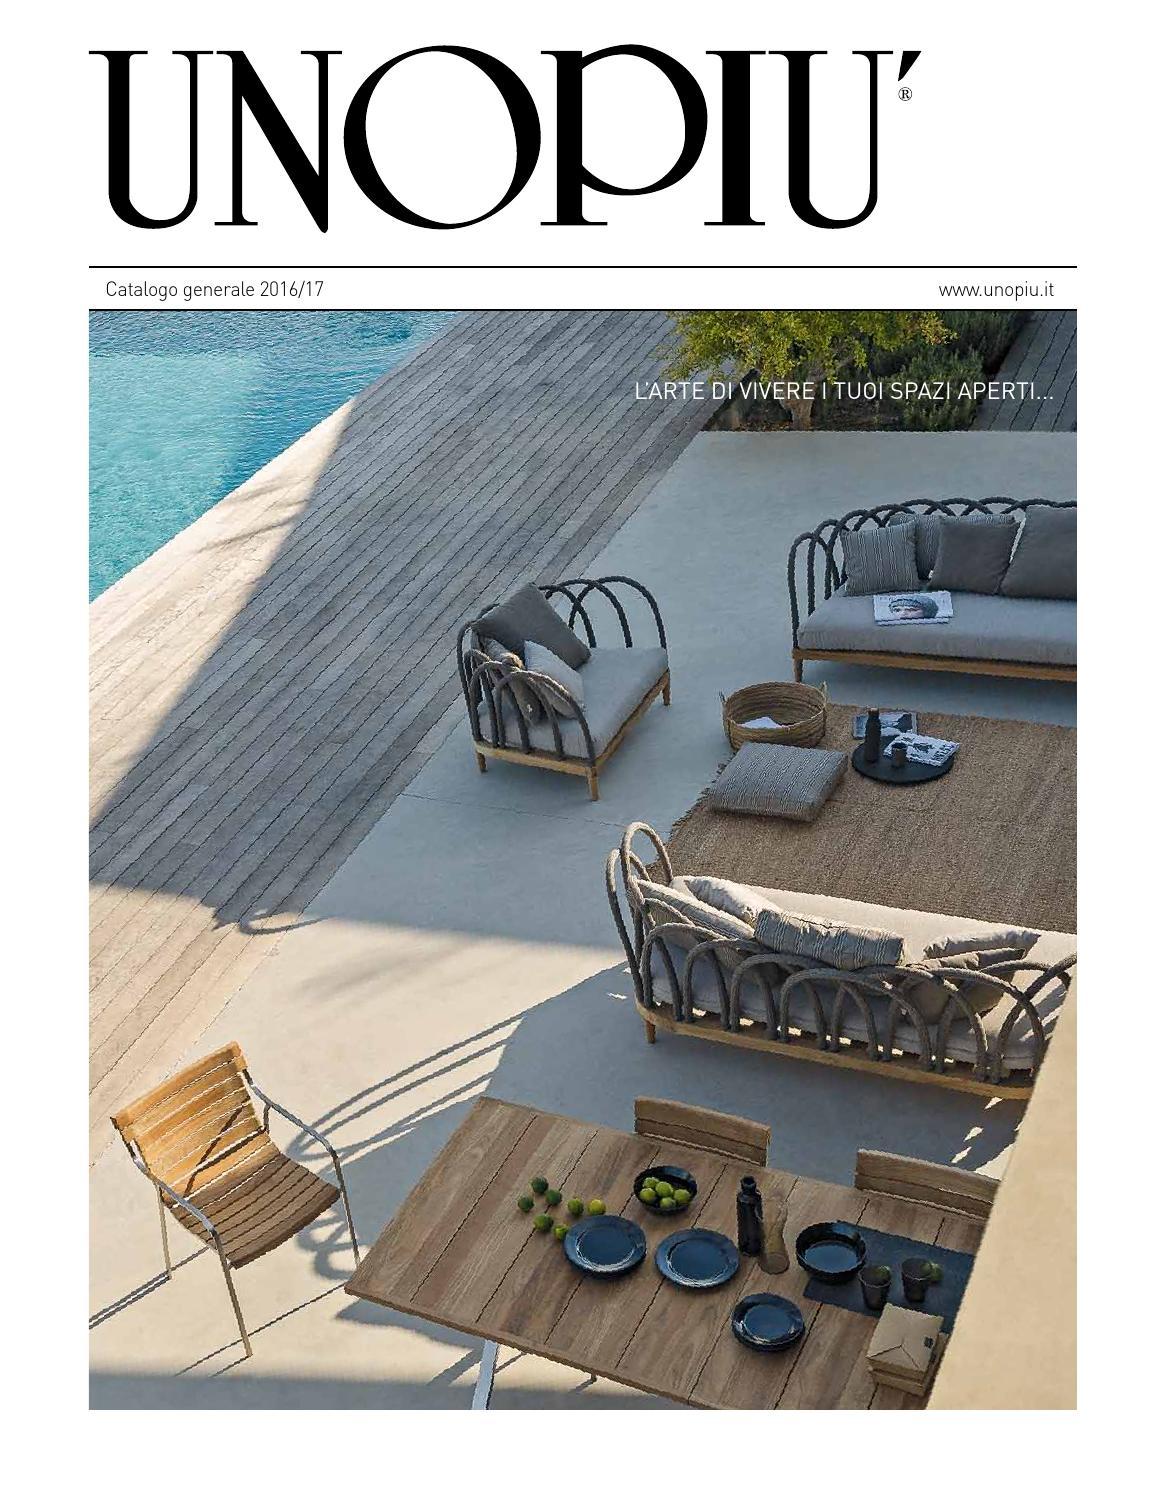 catalogo generale unopi 2016 by unopi spa issuu On catalogo unopiu